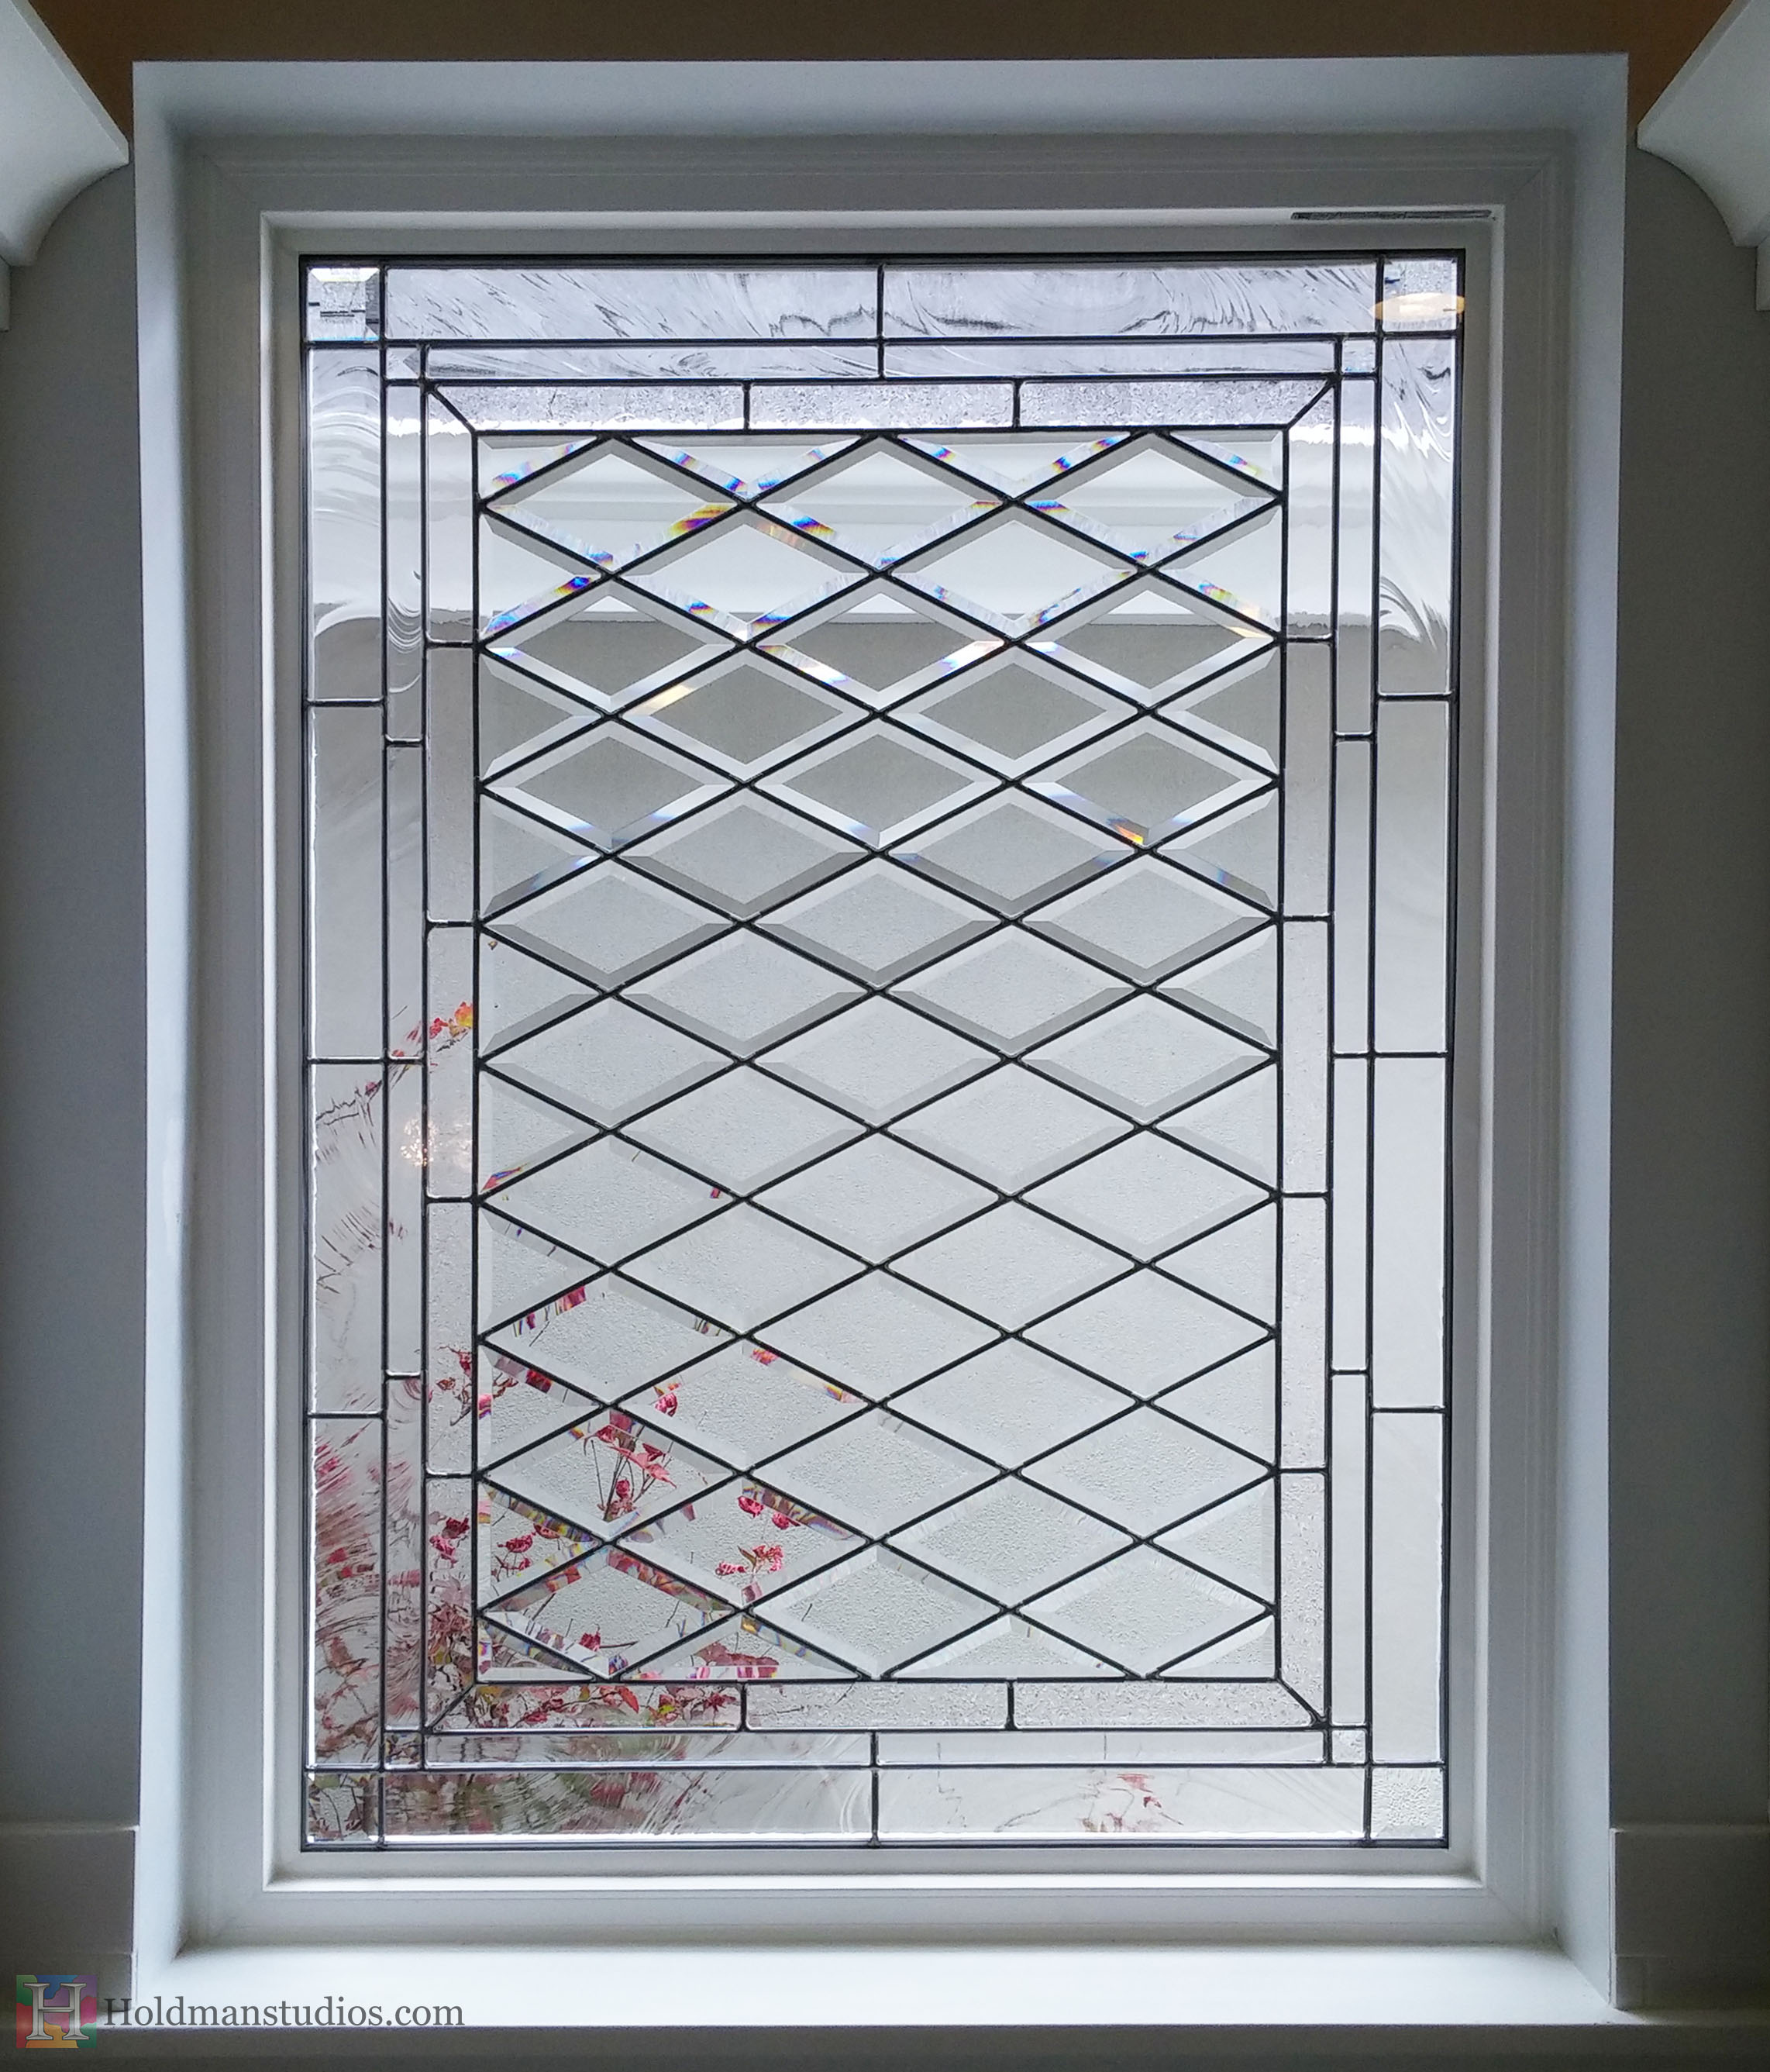 Holdman-Studios-Stained-Glass-Window-Kitchen-Clear-Beveled-Geometric-Pattern-Diamonds-Squares.jpg